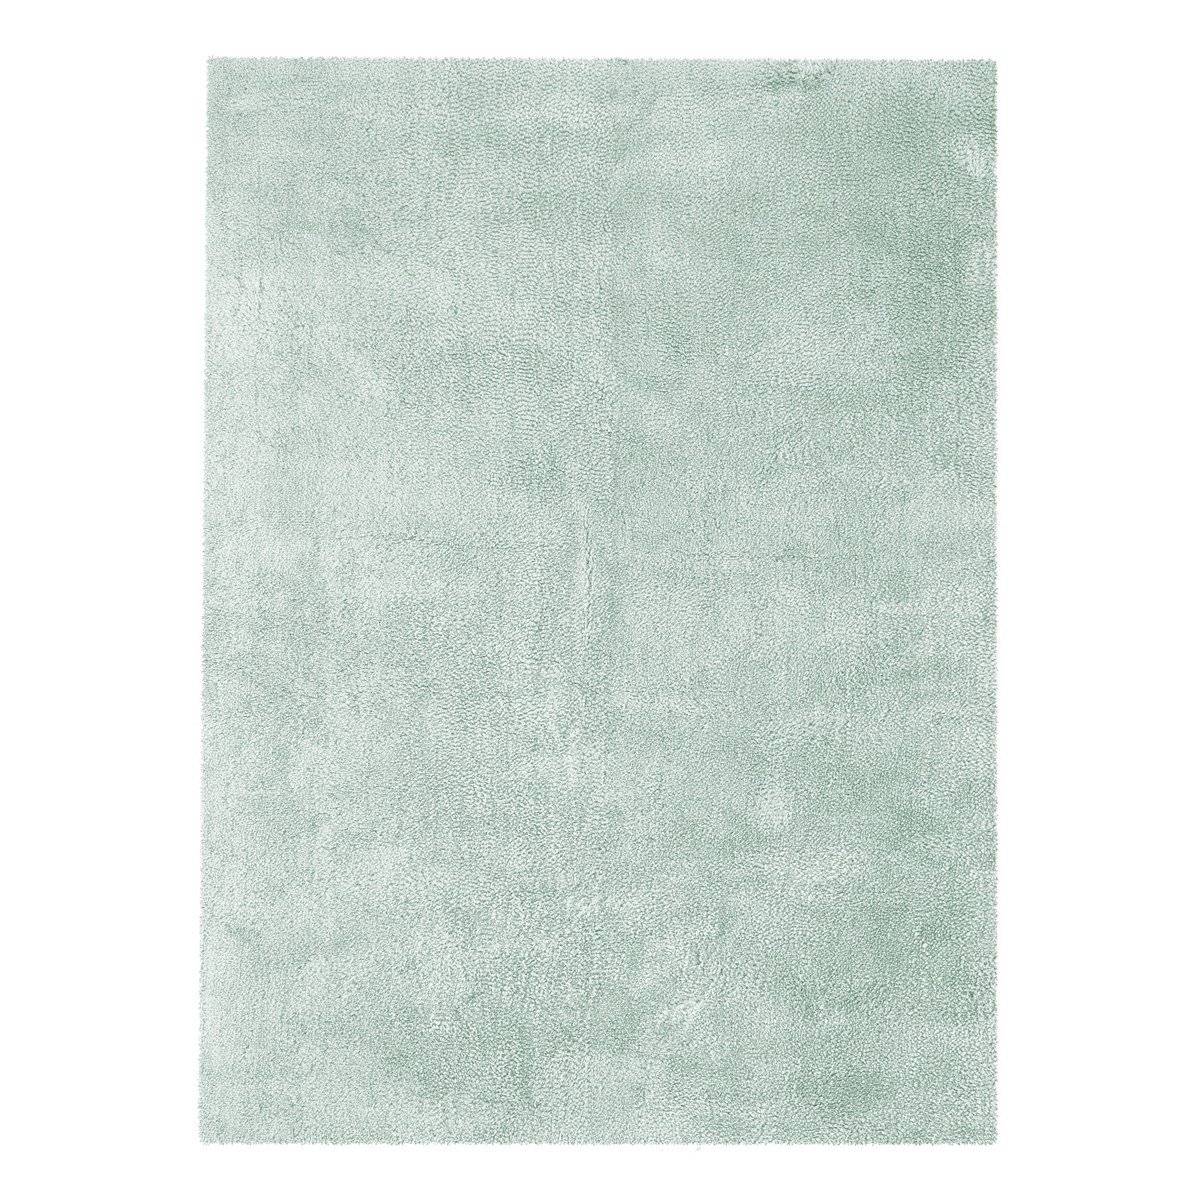 Tapis attrayante flachflorteppich Jacquard-tissés bleu ciel 120x180cm